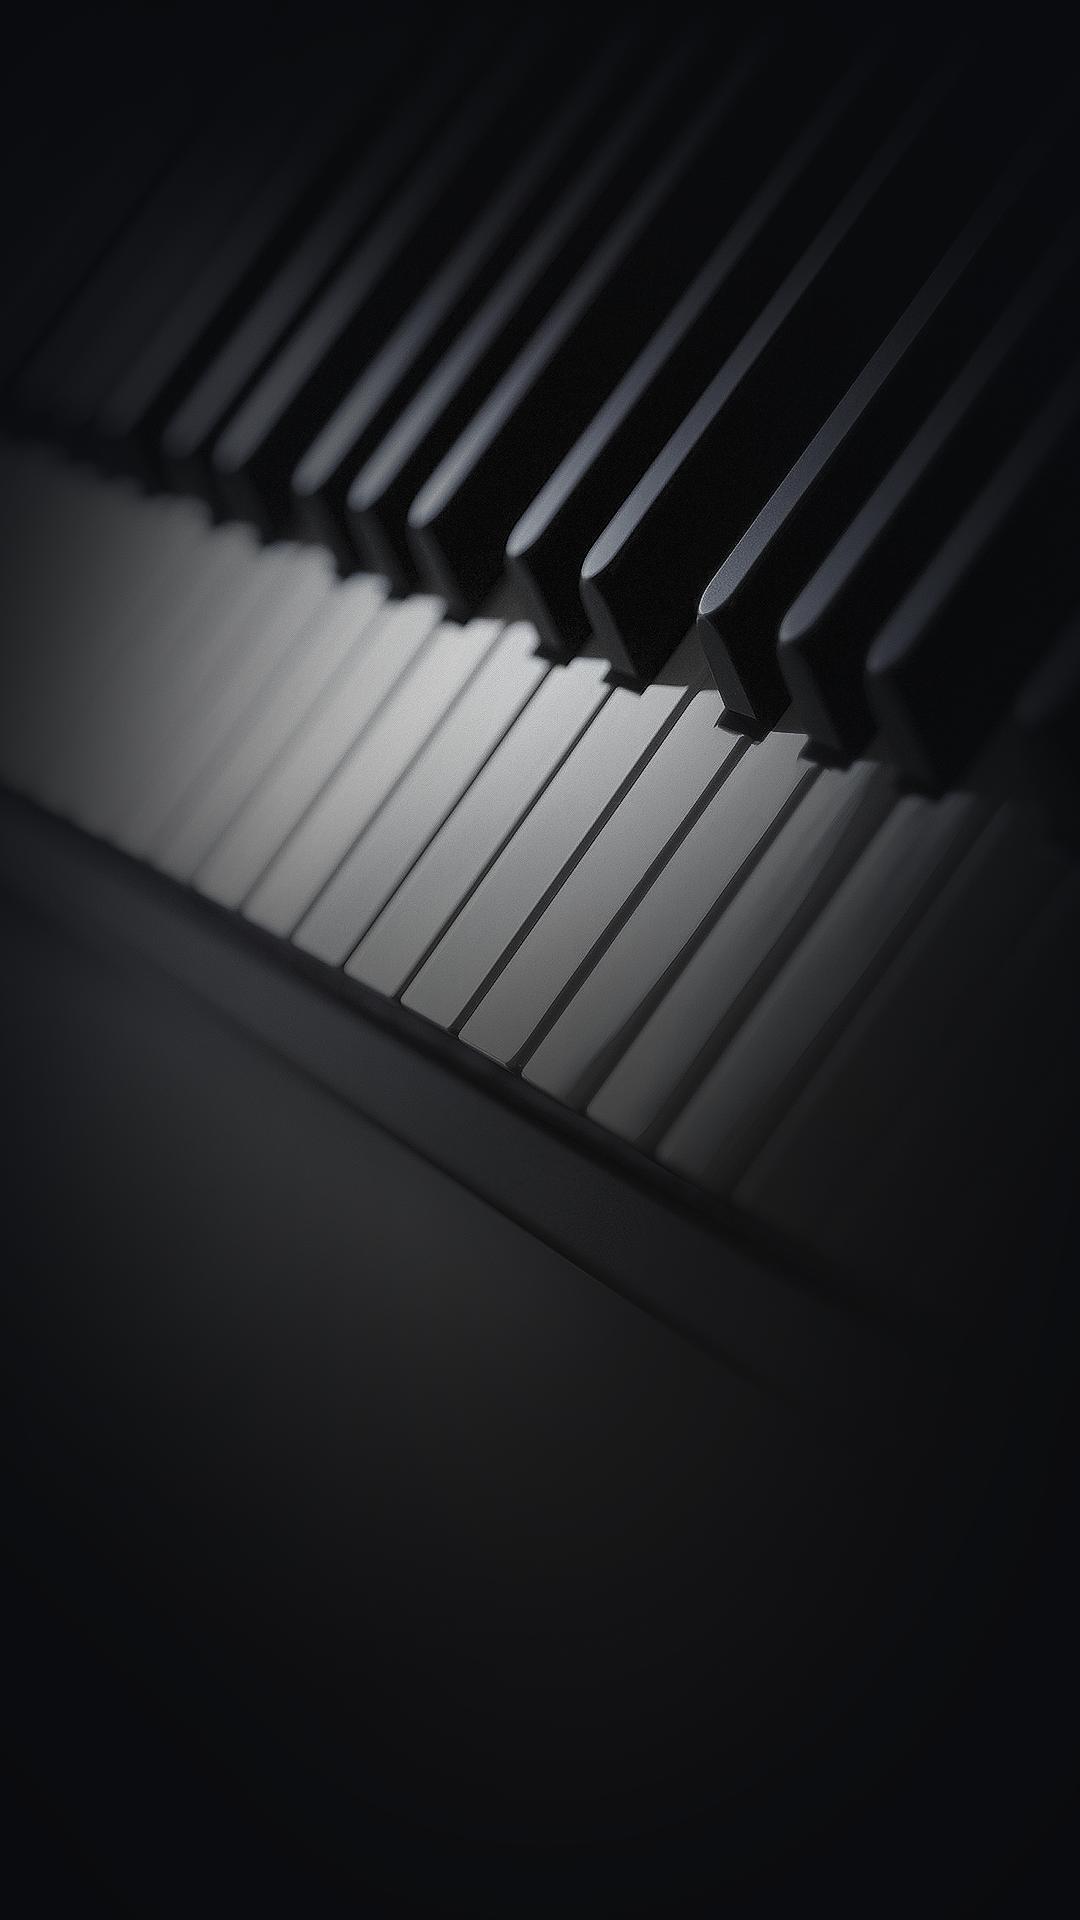 Piano Wallpaper Lenovo Wallpapers Android Wallpaper Black Wallpaper